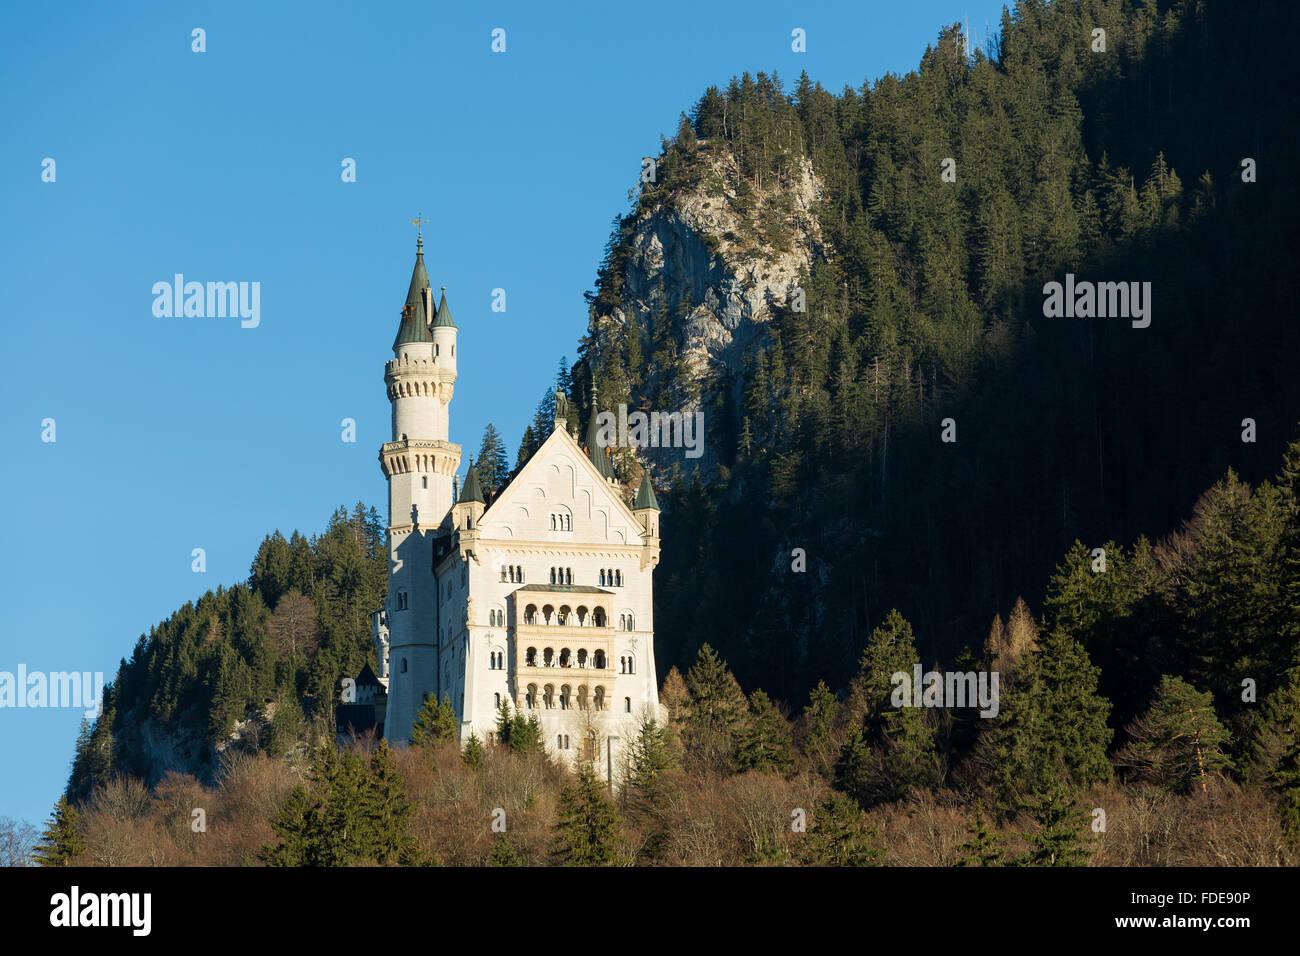 Castle Neuschwanstein near Füssen, Bavaria, Germany Stock Photo